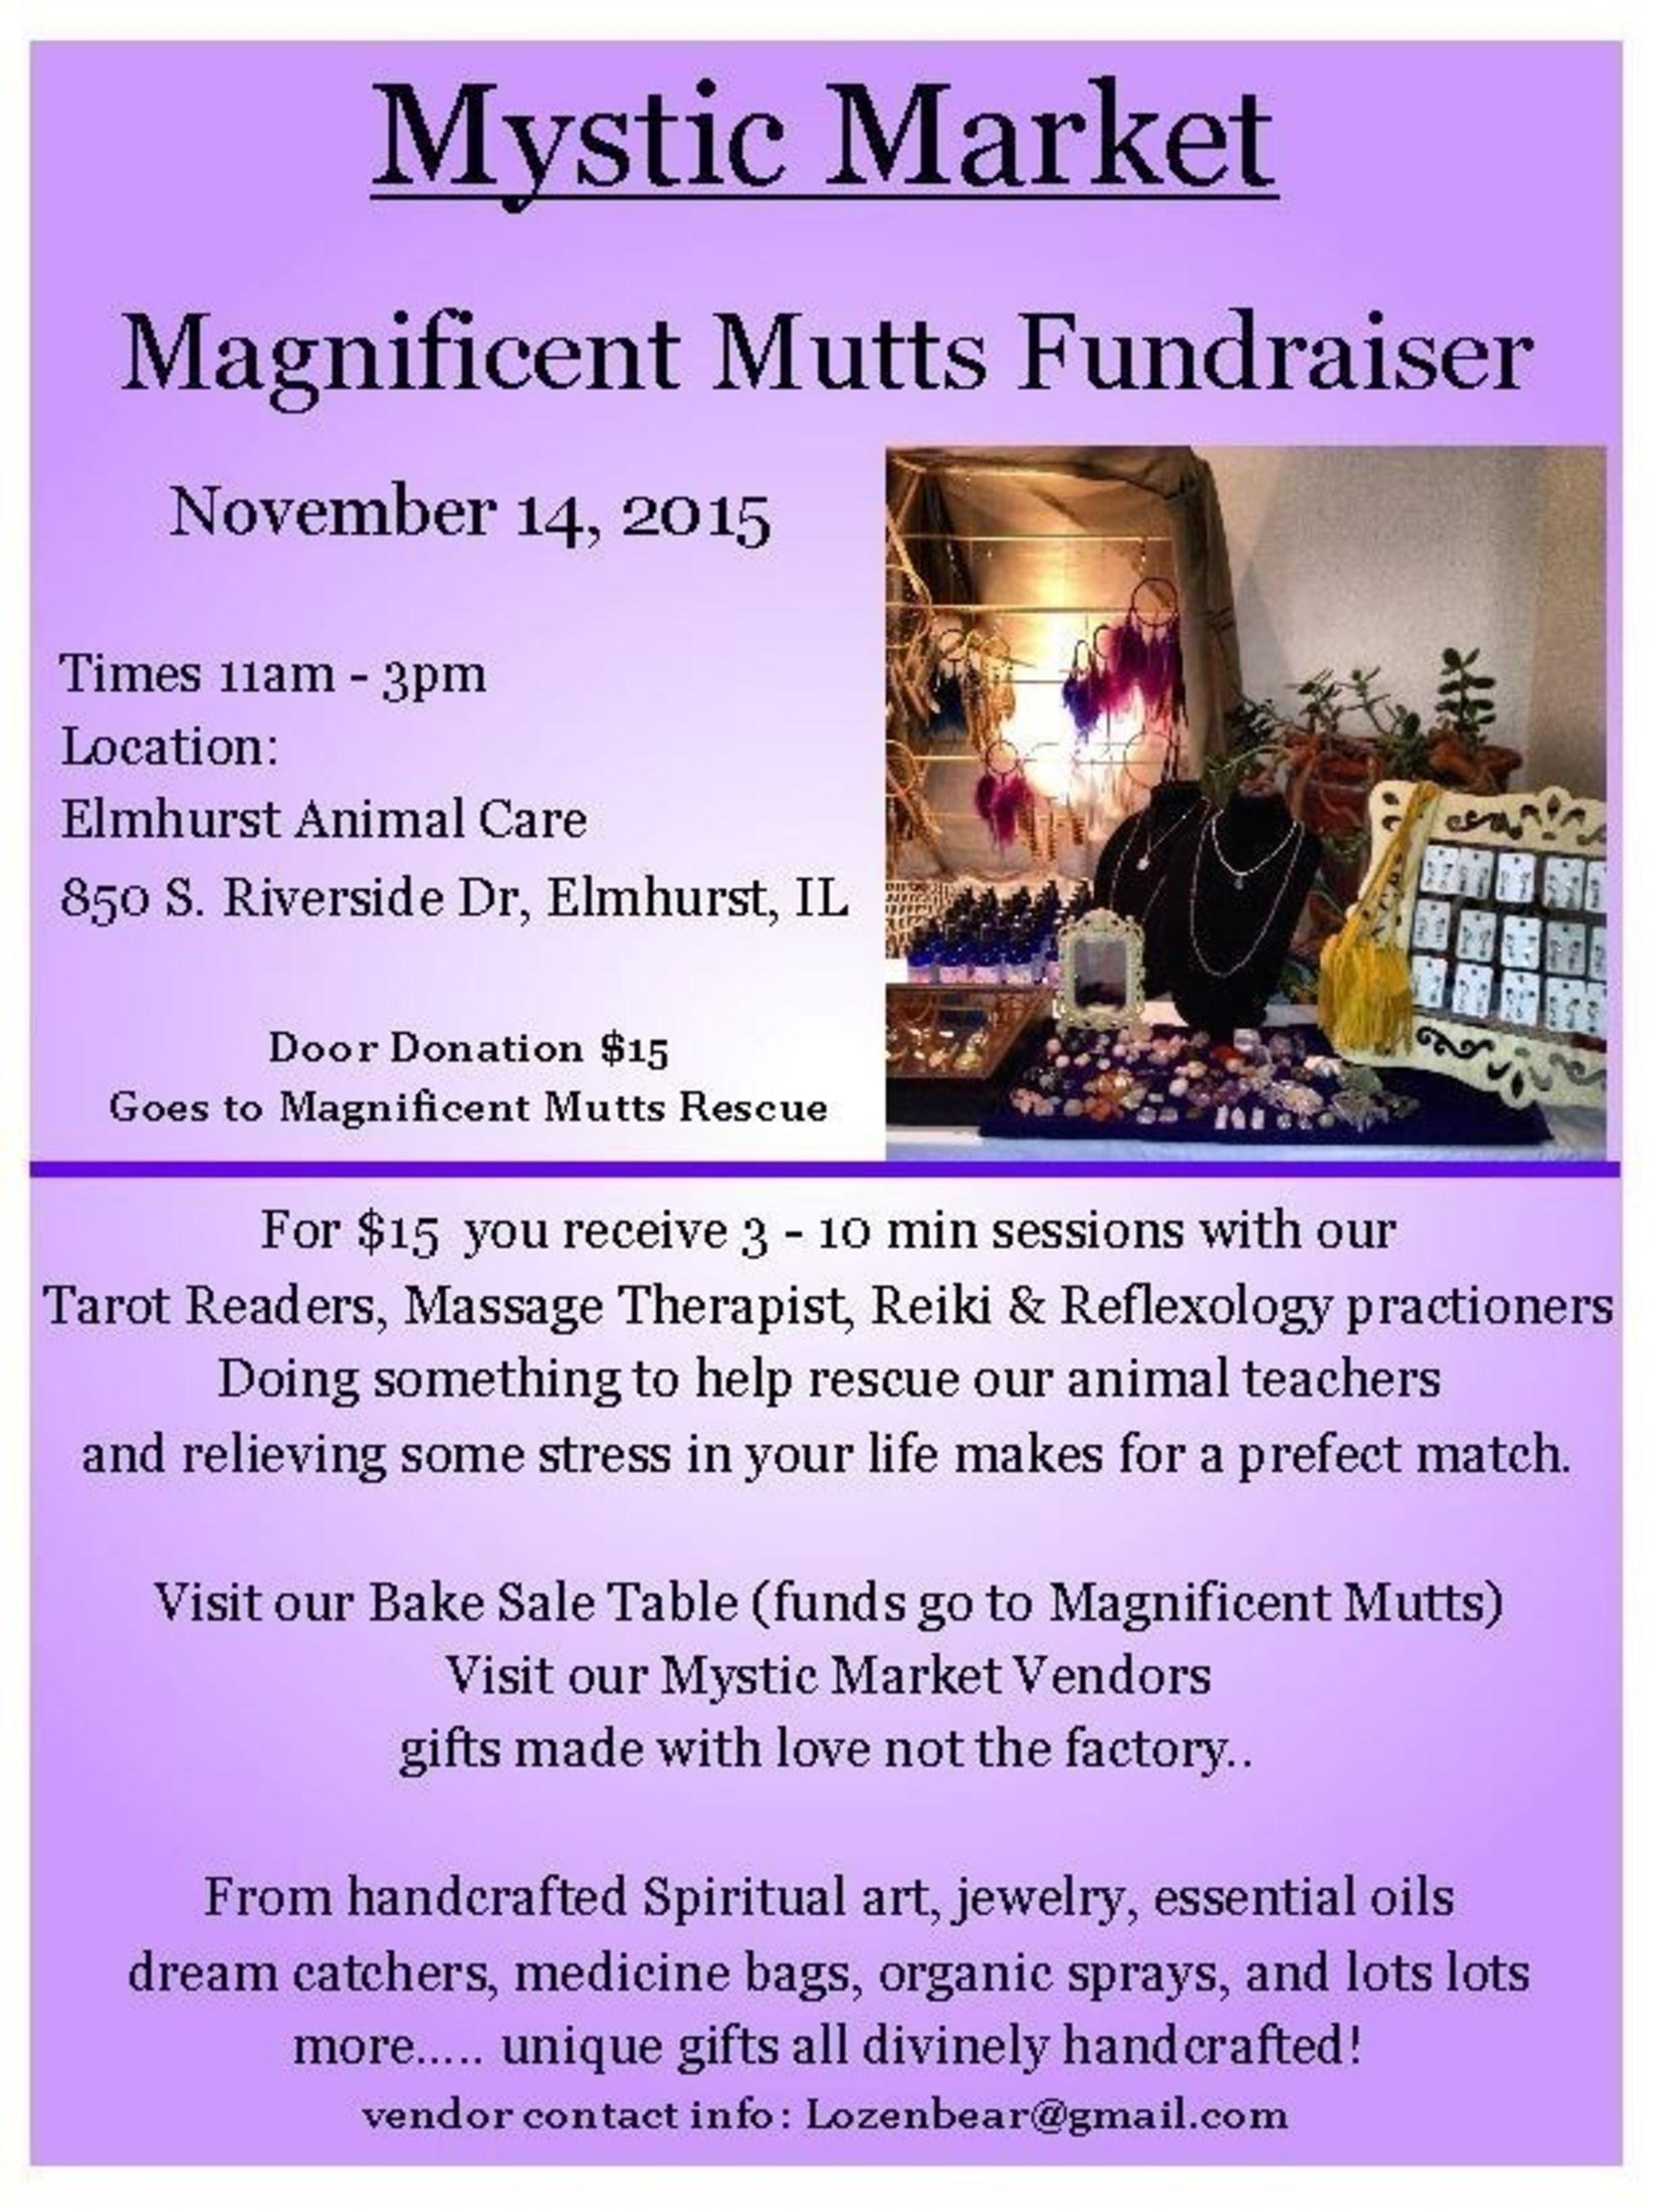 Elmhurst Animal Care Center to Host November 2015 Magnificent Mutts Fundraiser